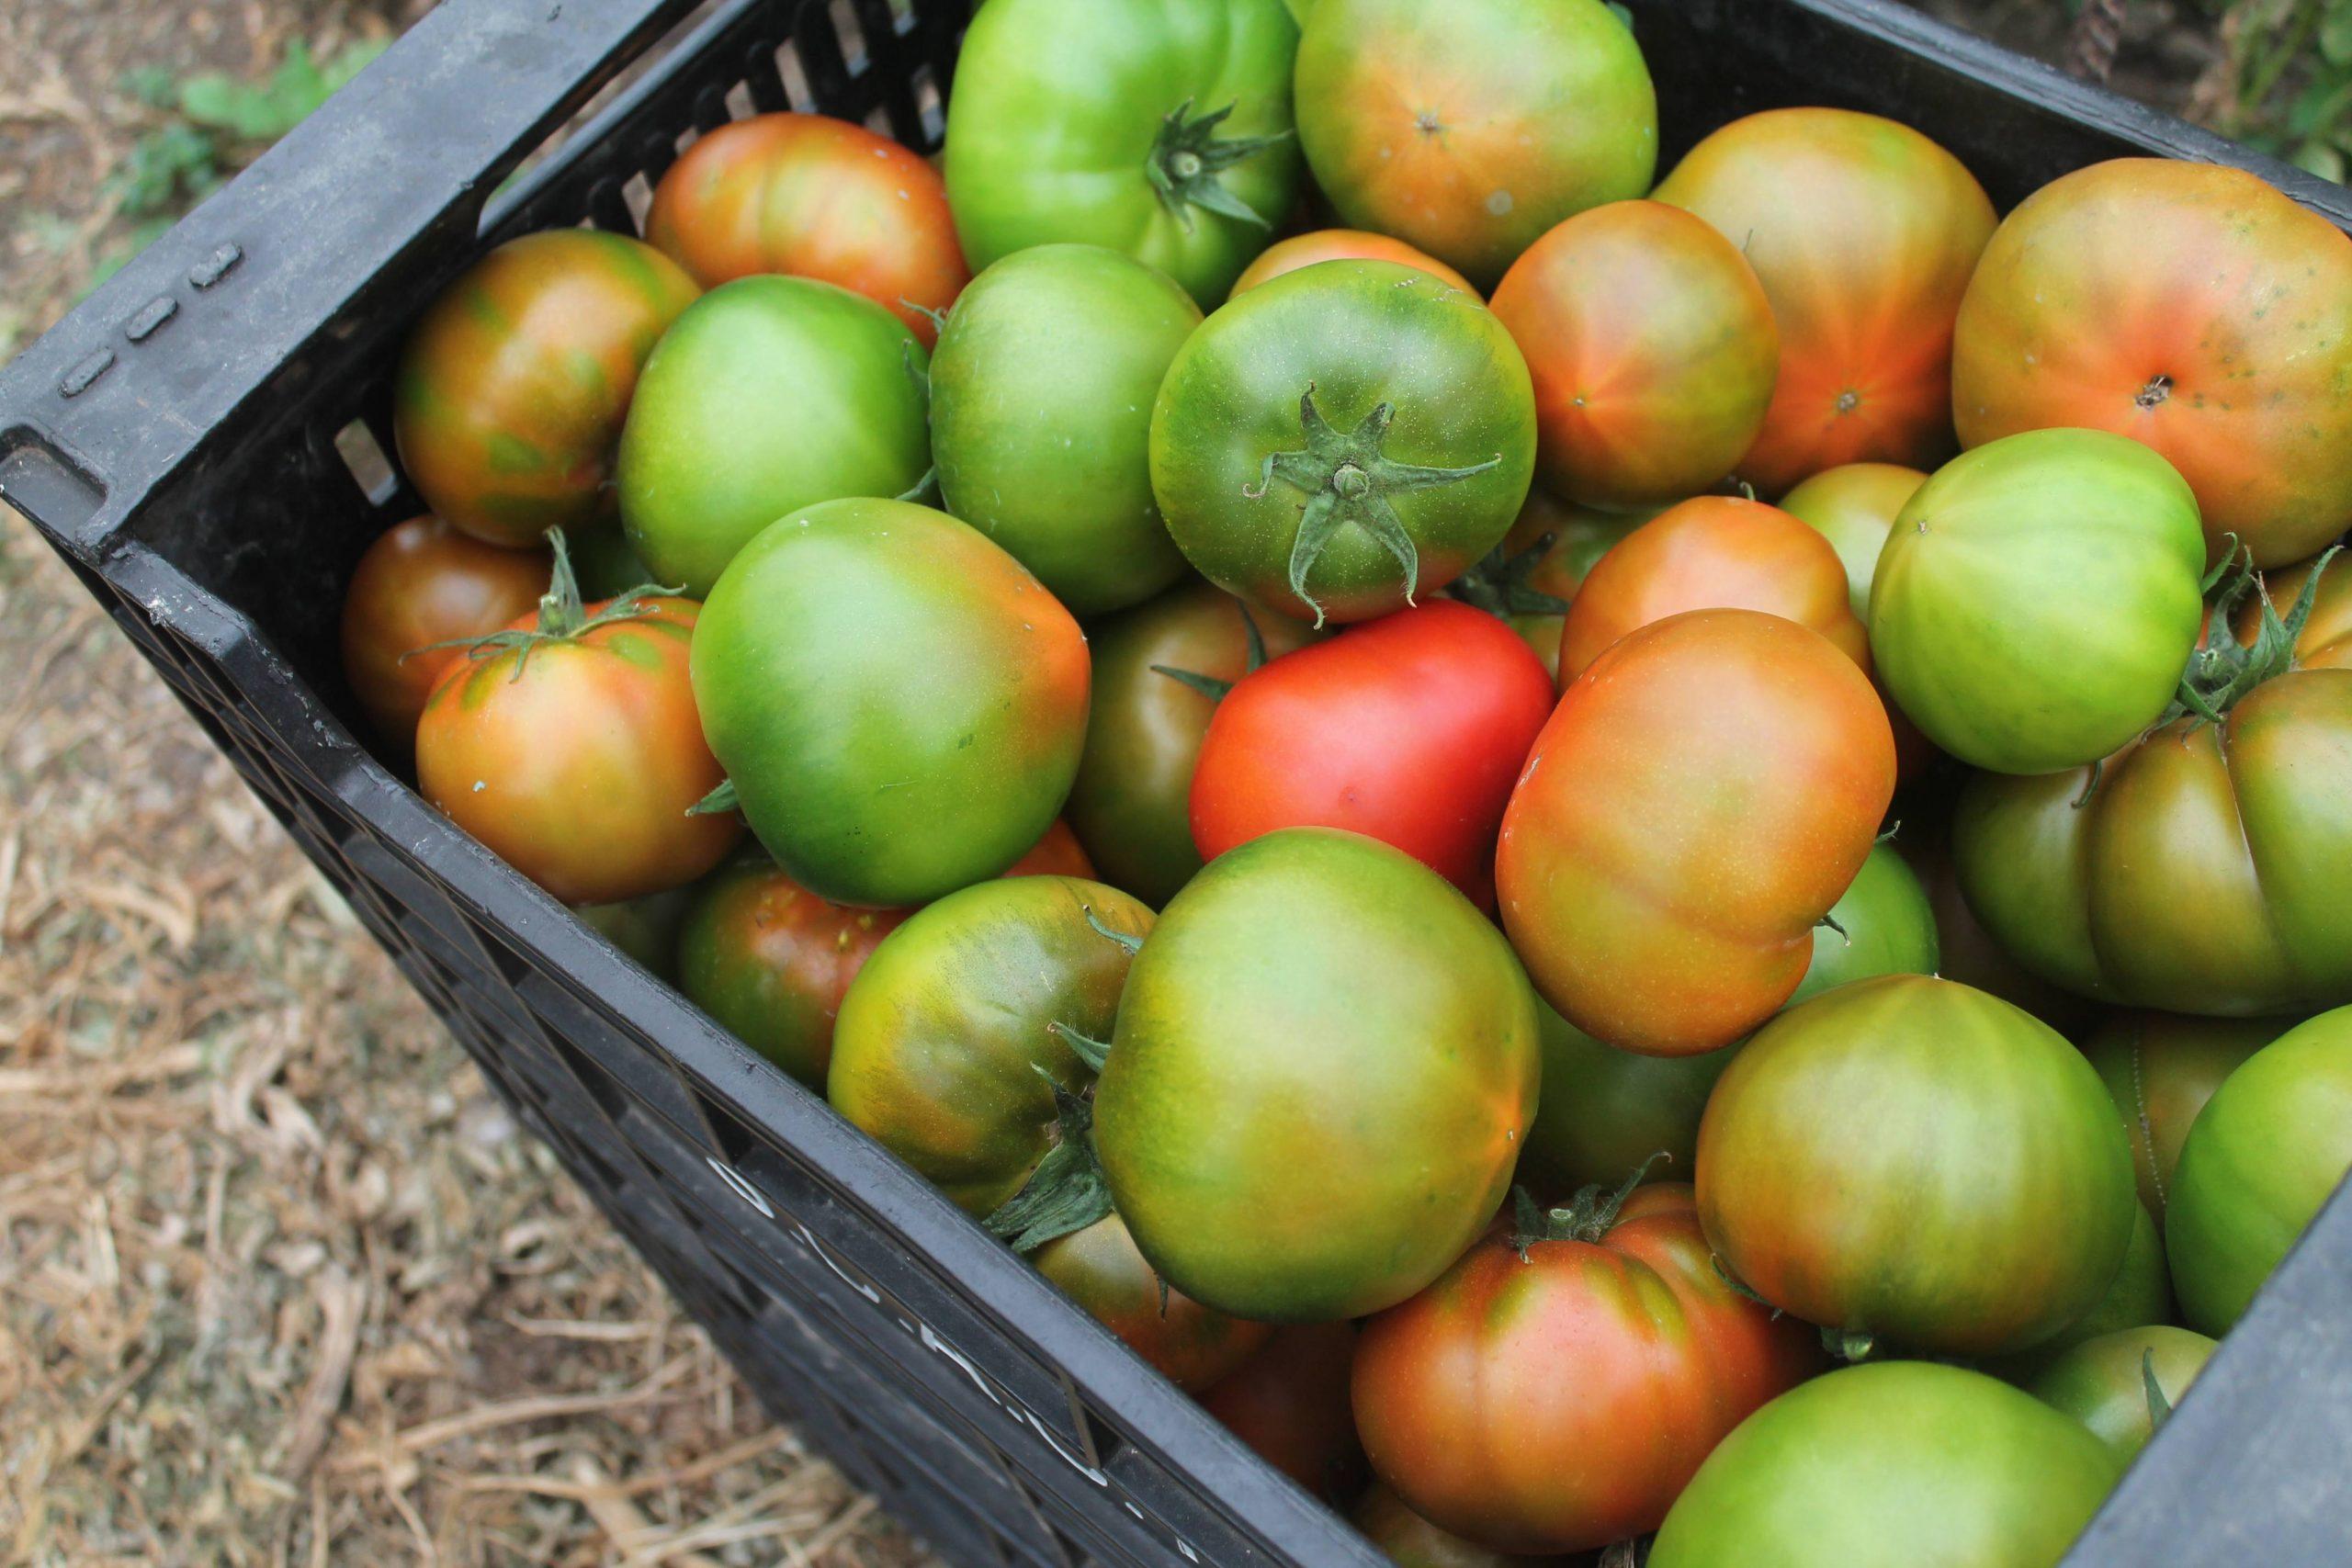 Los tomates de Tegueste – Mermelada de tomate